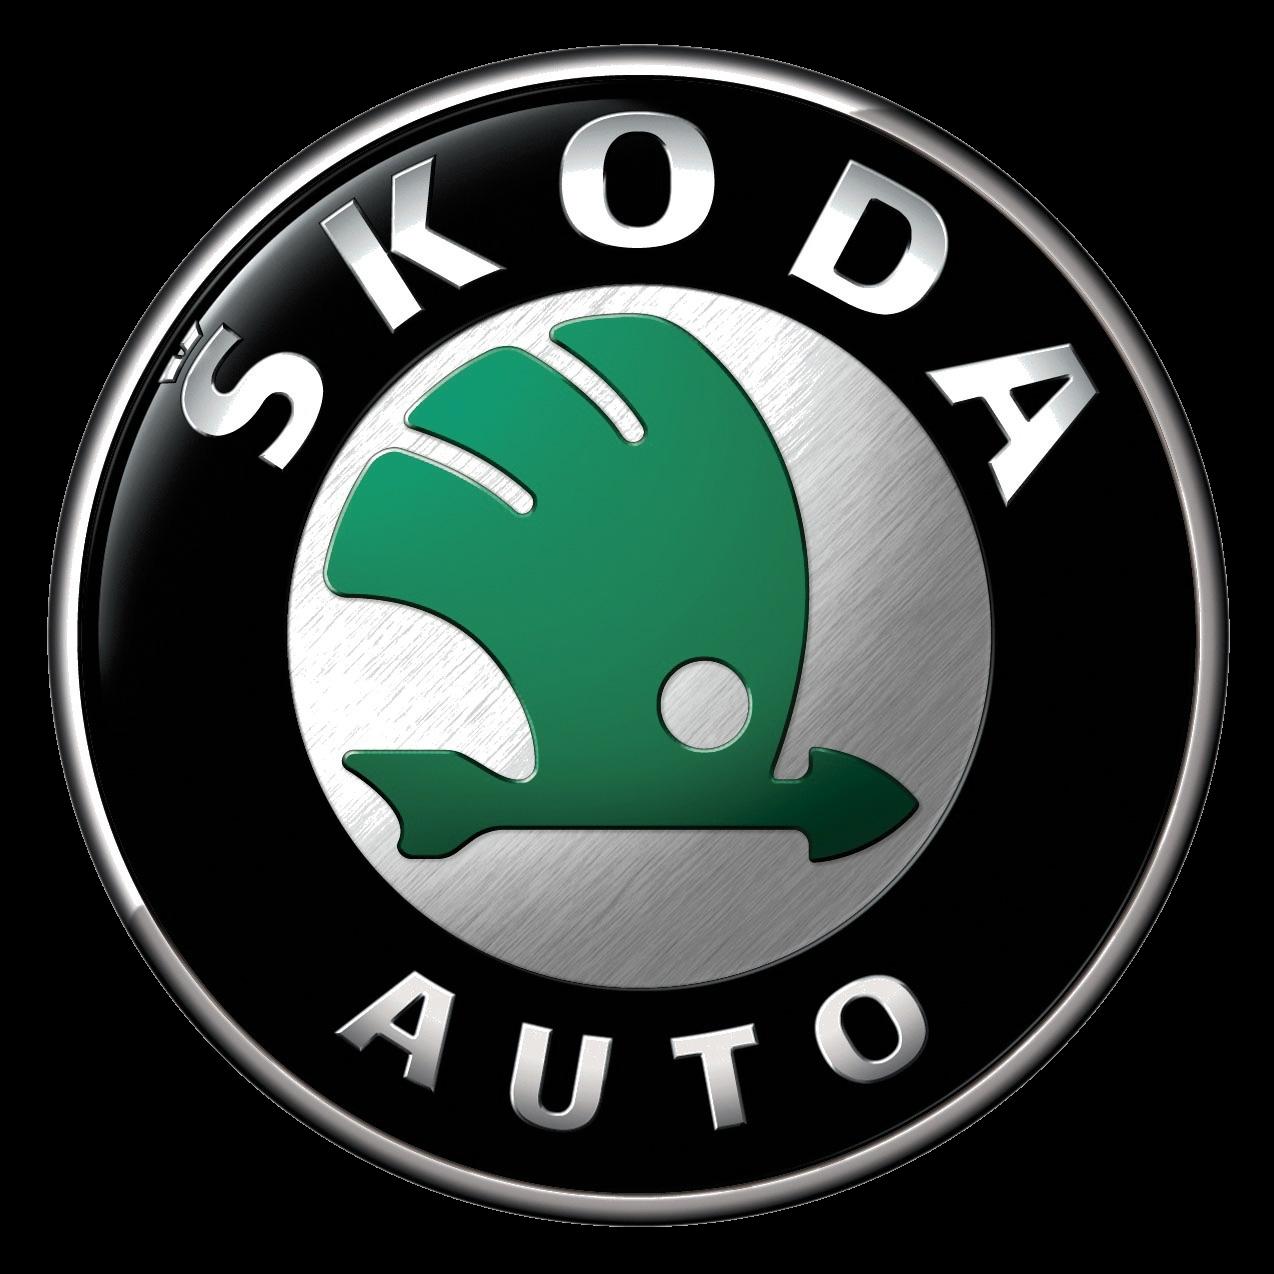 Skoda Auto Logo PNG Image